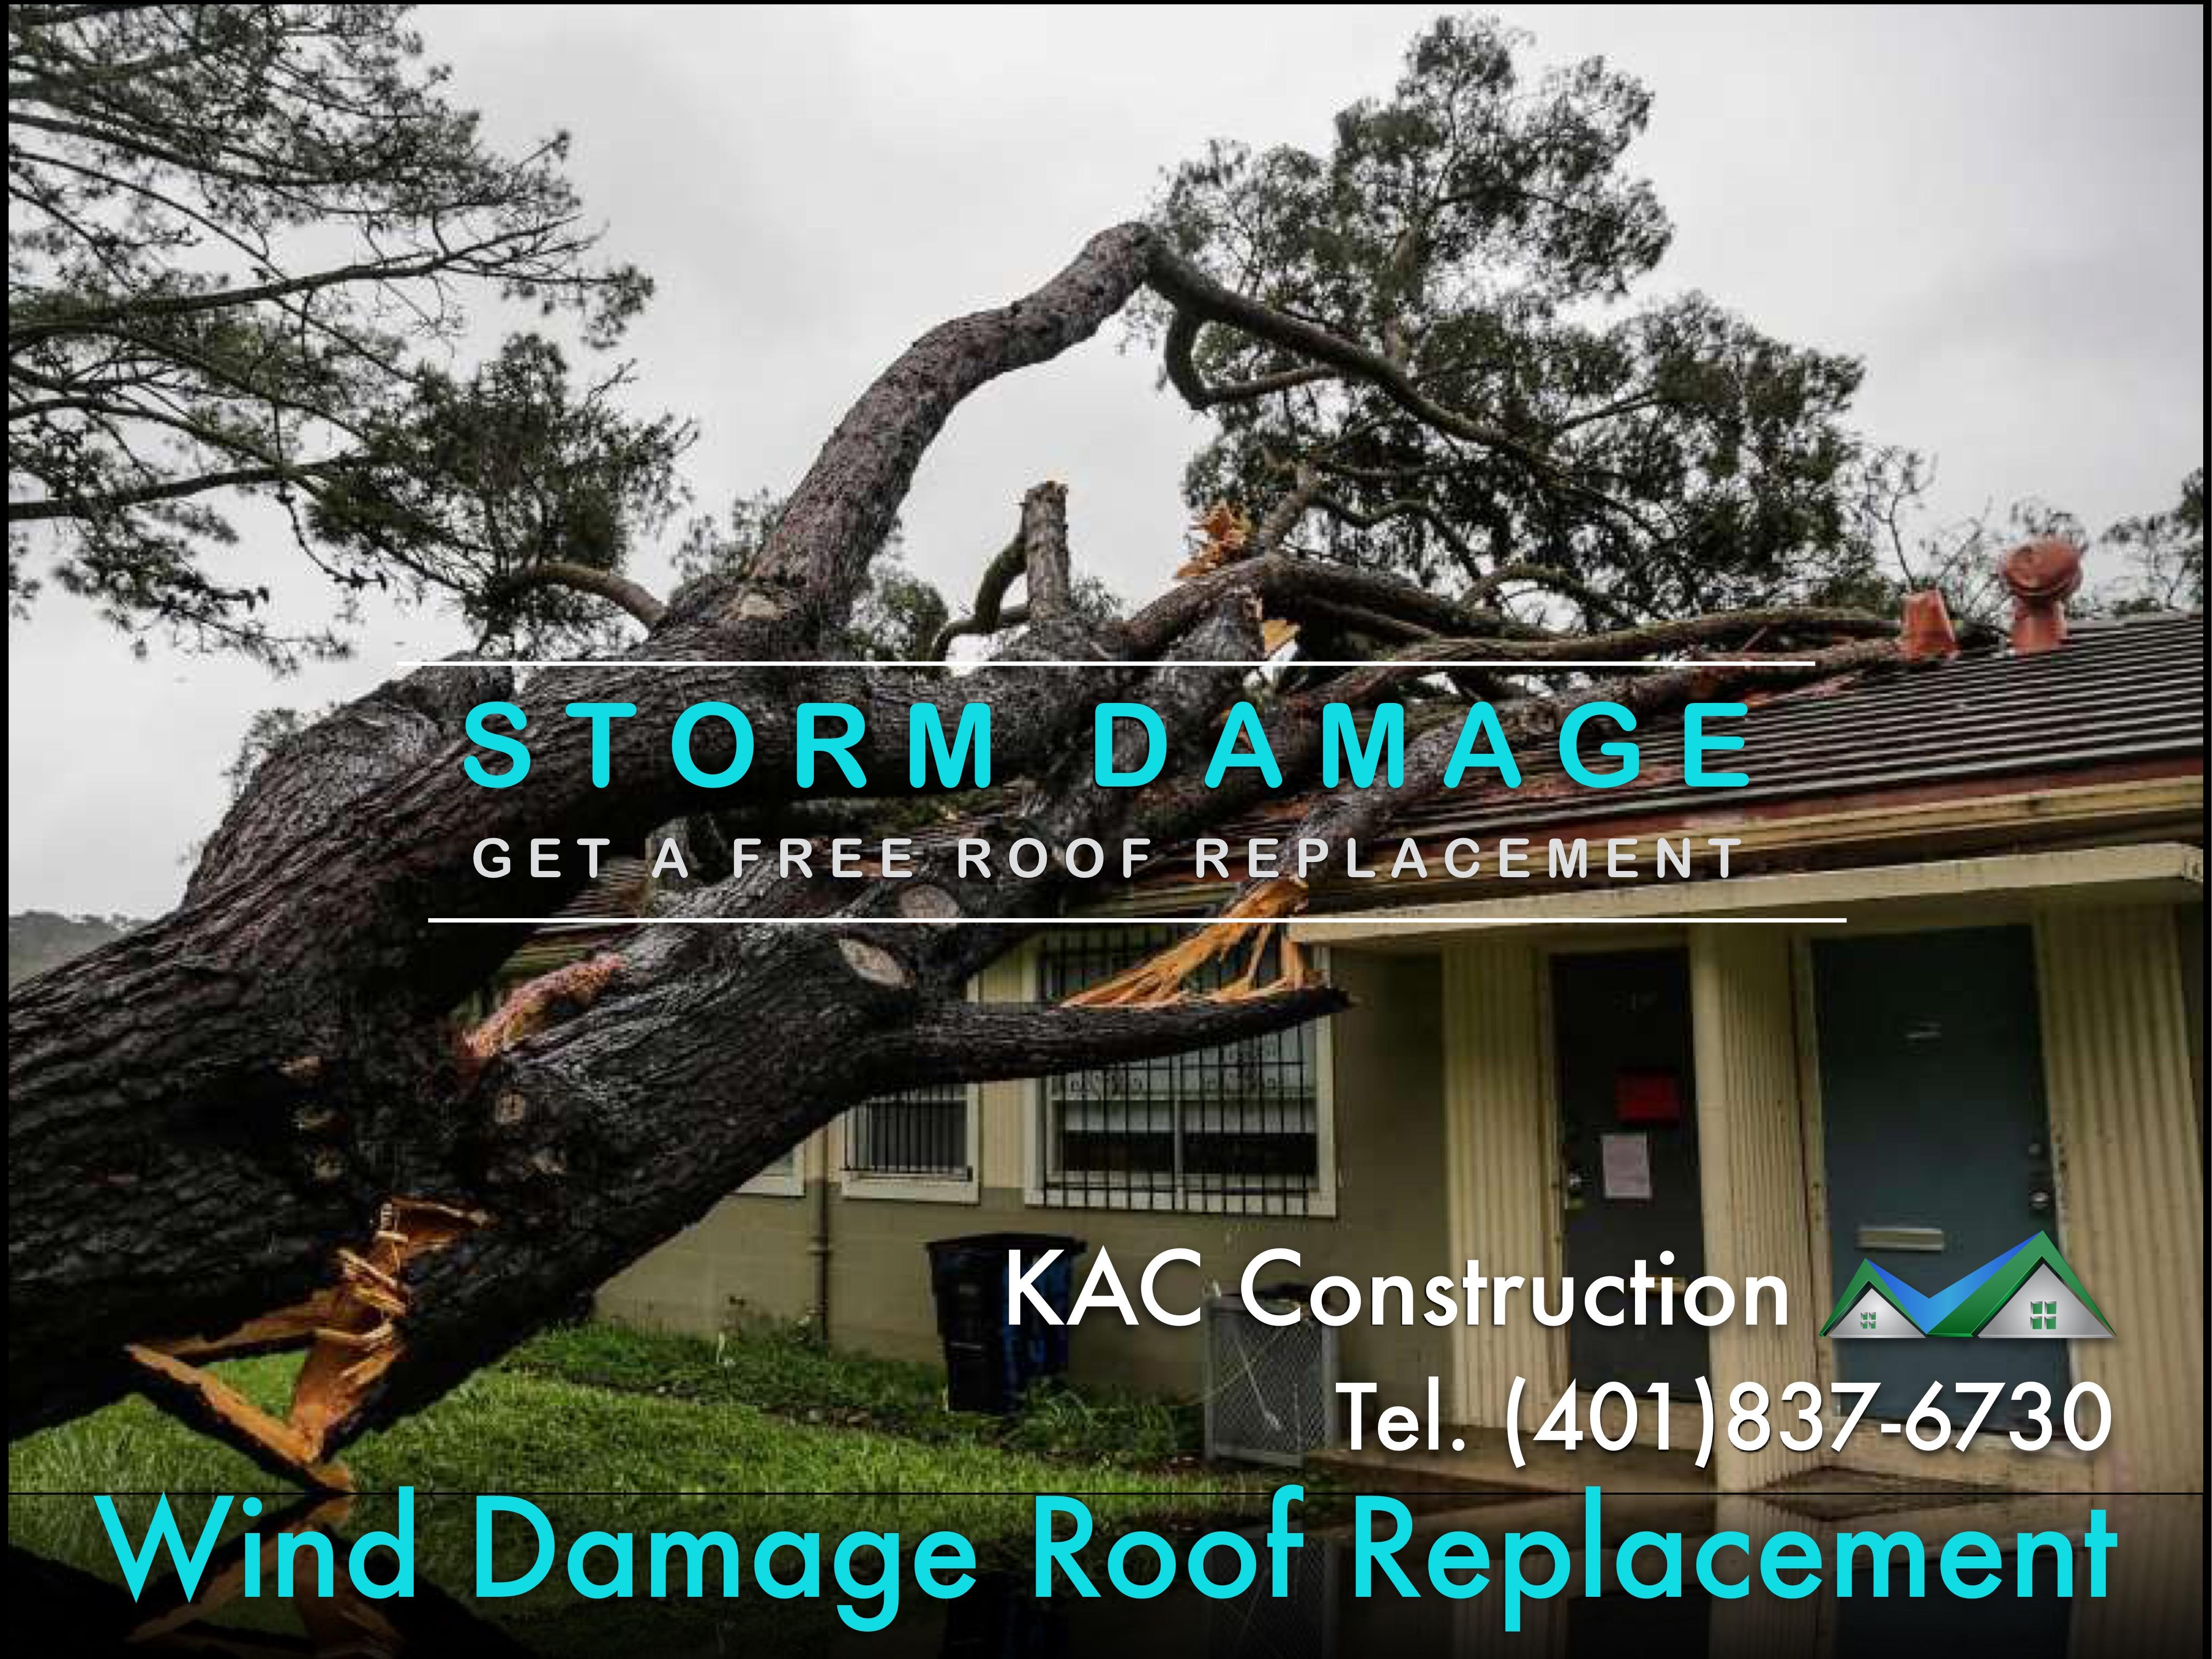 Storm damage, storm damage ri. Storm damage roof replacement, storm damage roof repair ri, roof repair ri, roof replacement ri,